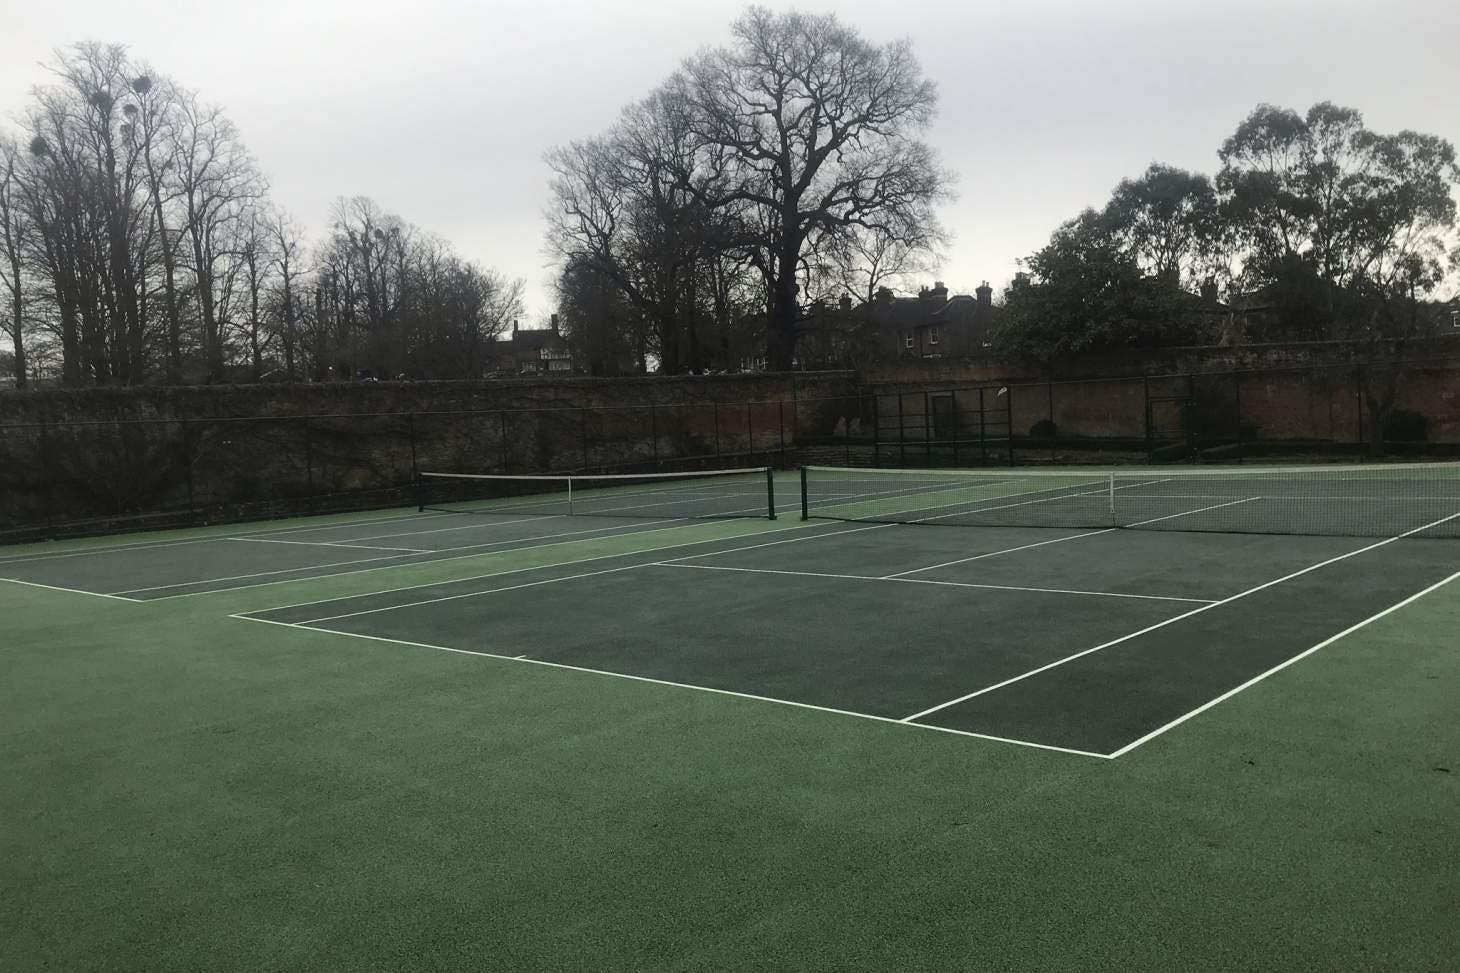 Stoke Park Outdoor | Hard (macadam) tennis court